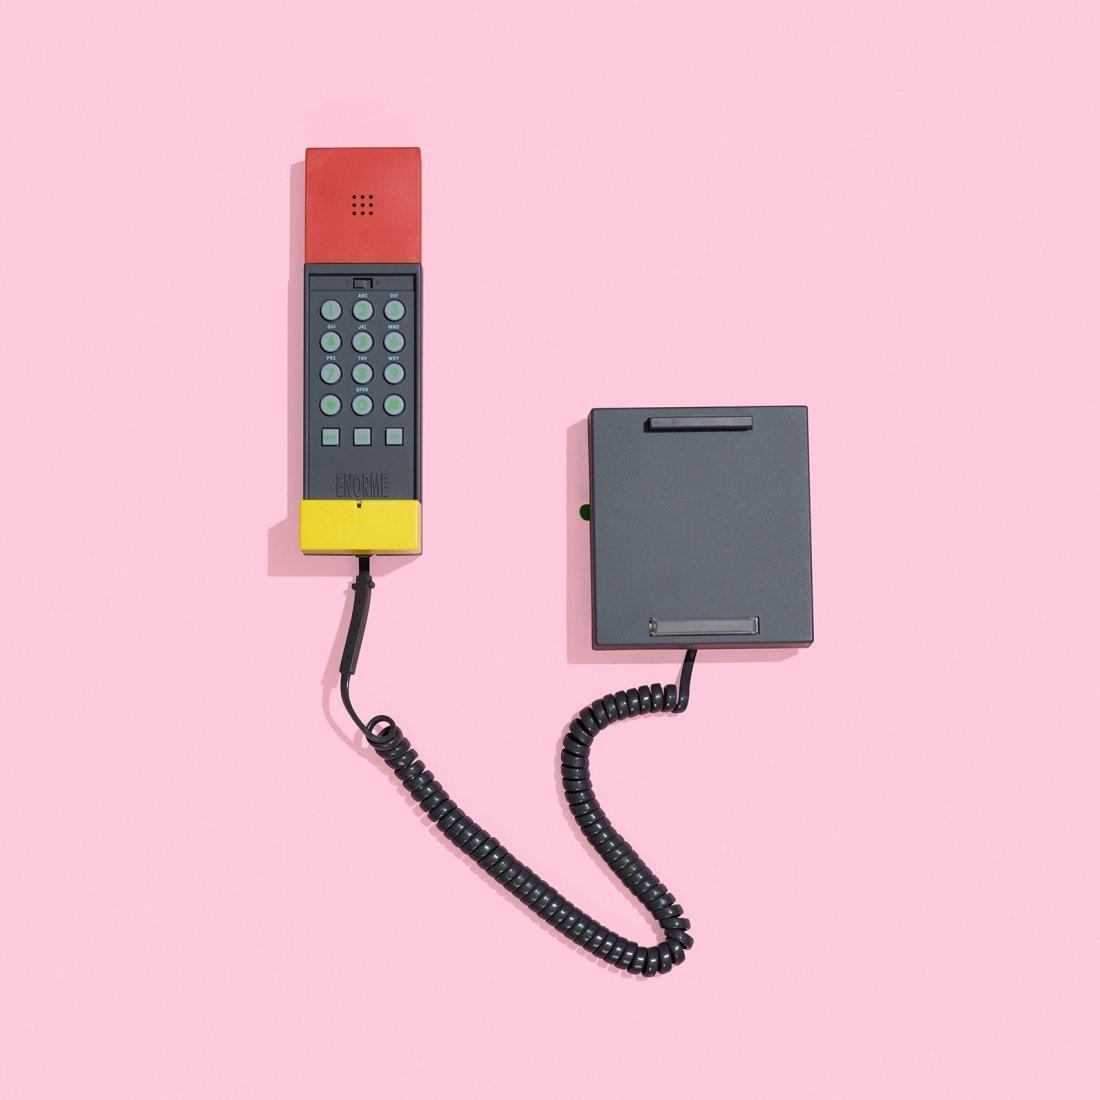 Sottsass Associati Enorme telephone